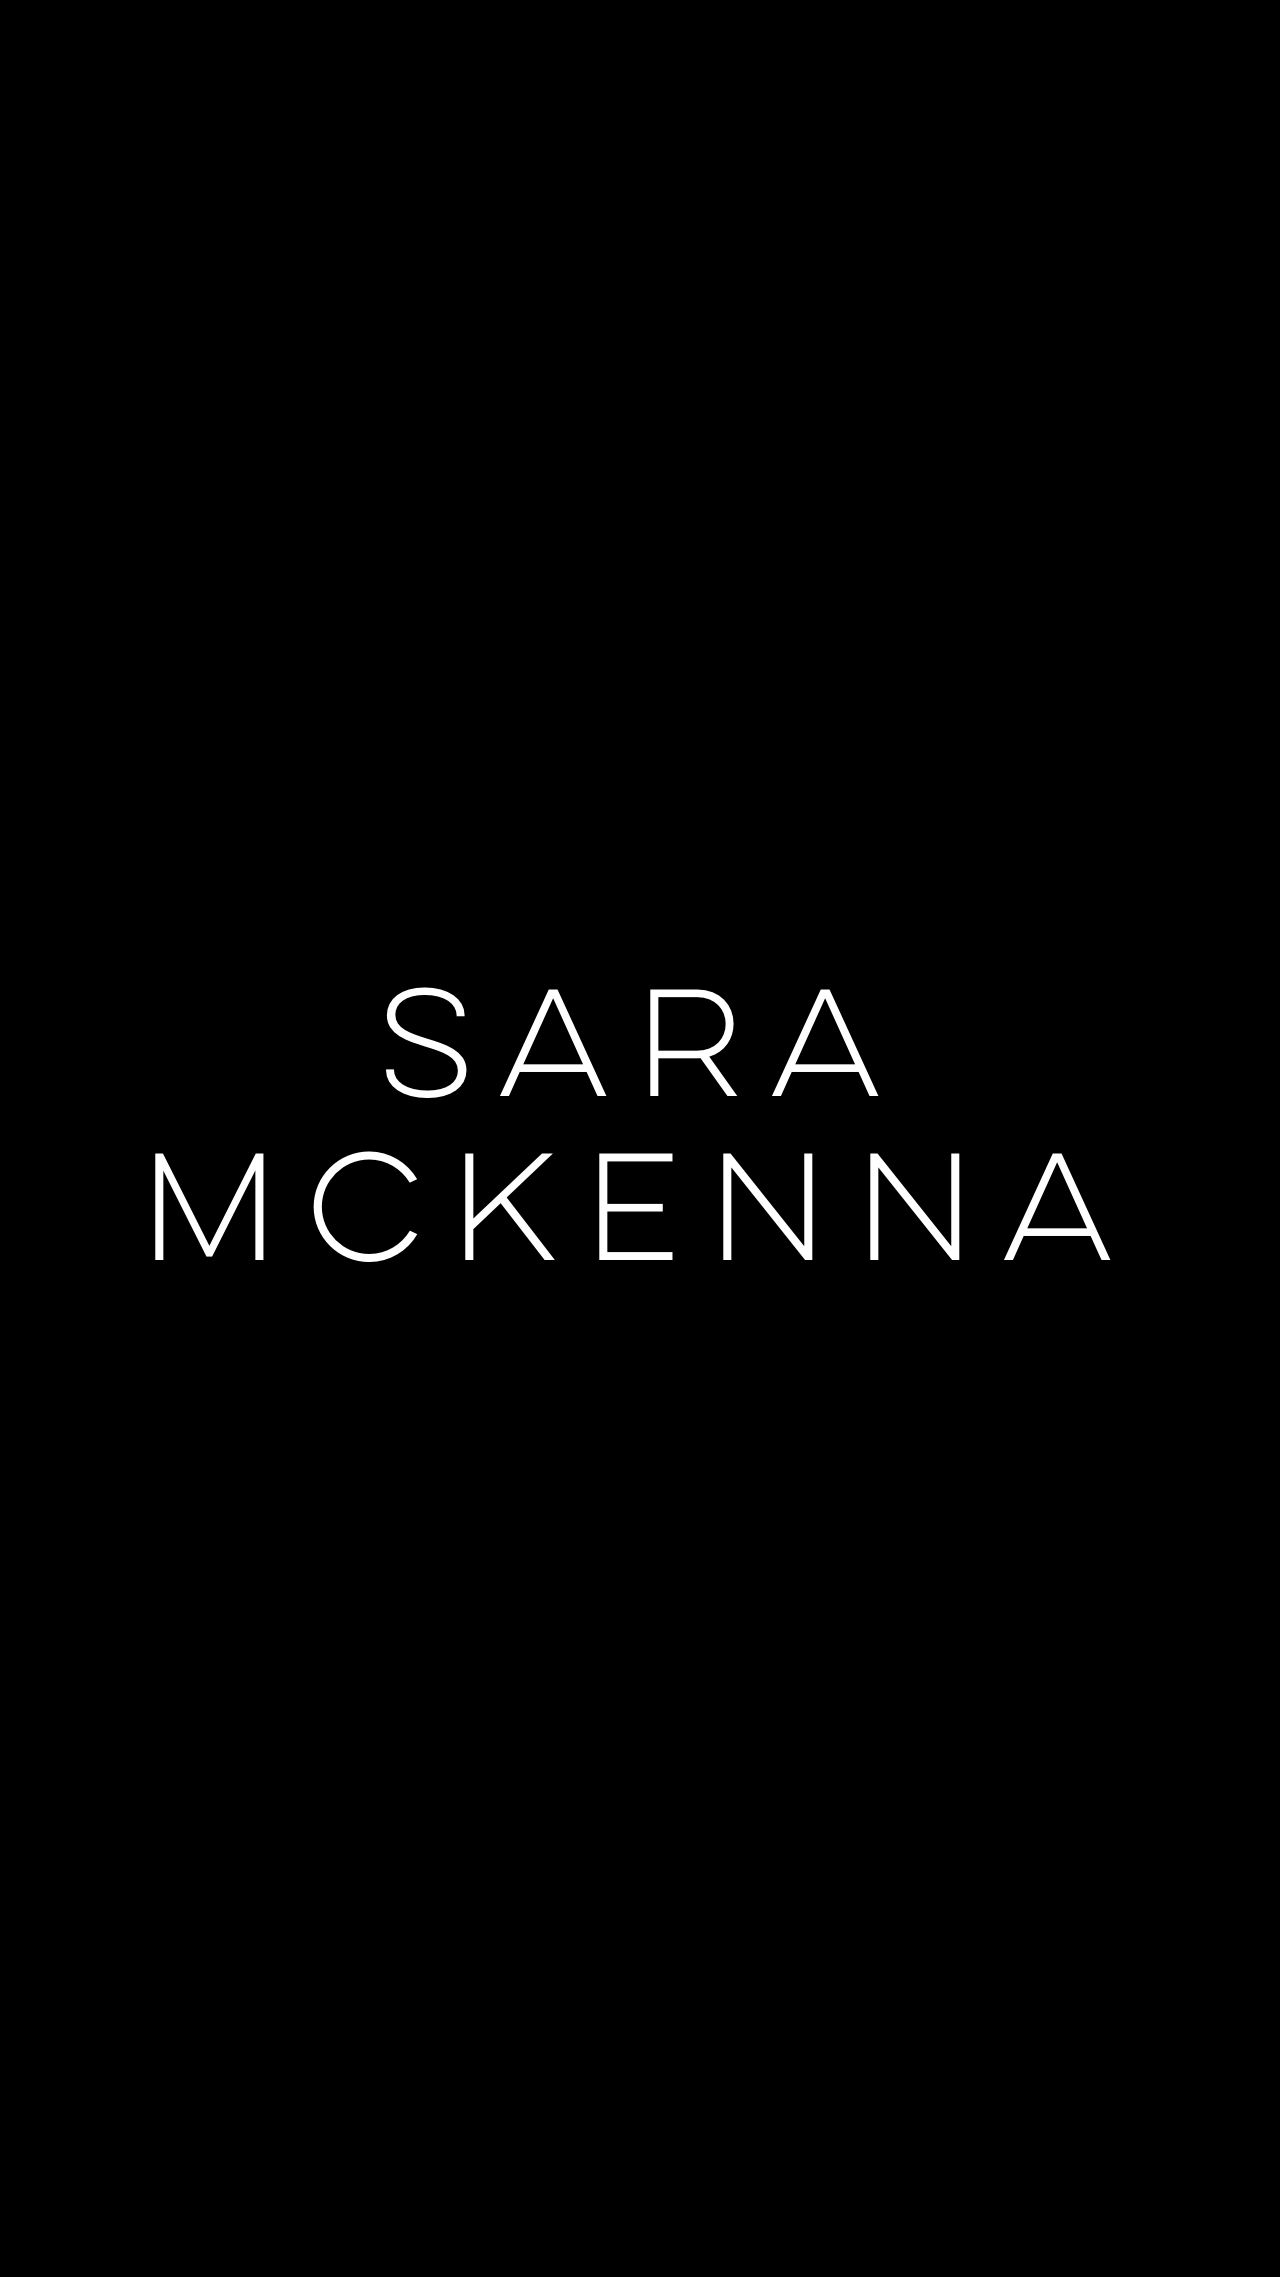 SARA MCKENNA.jpg